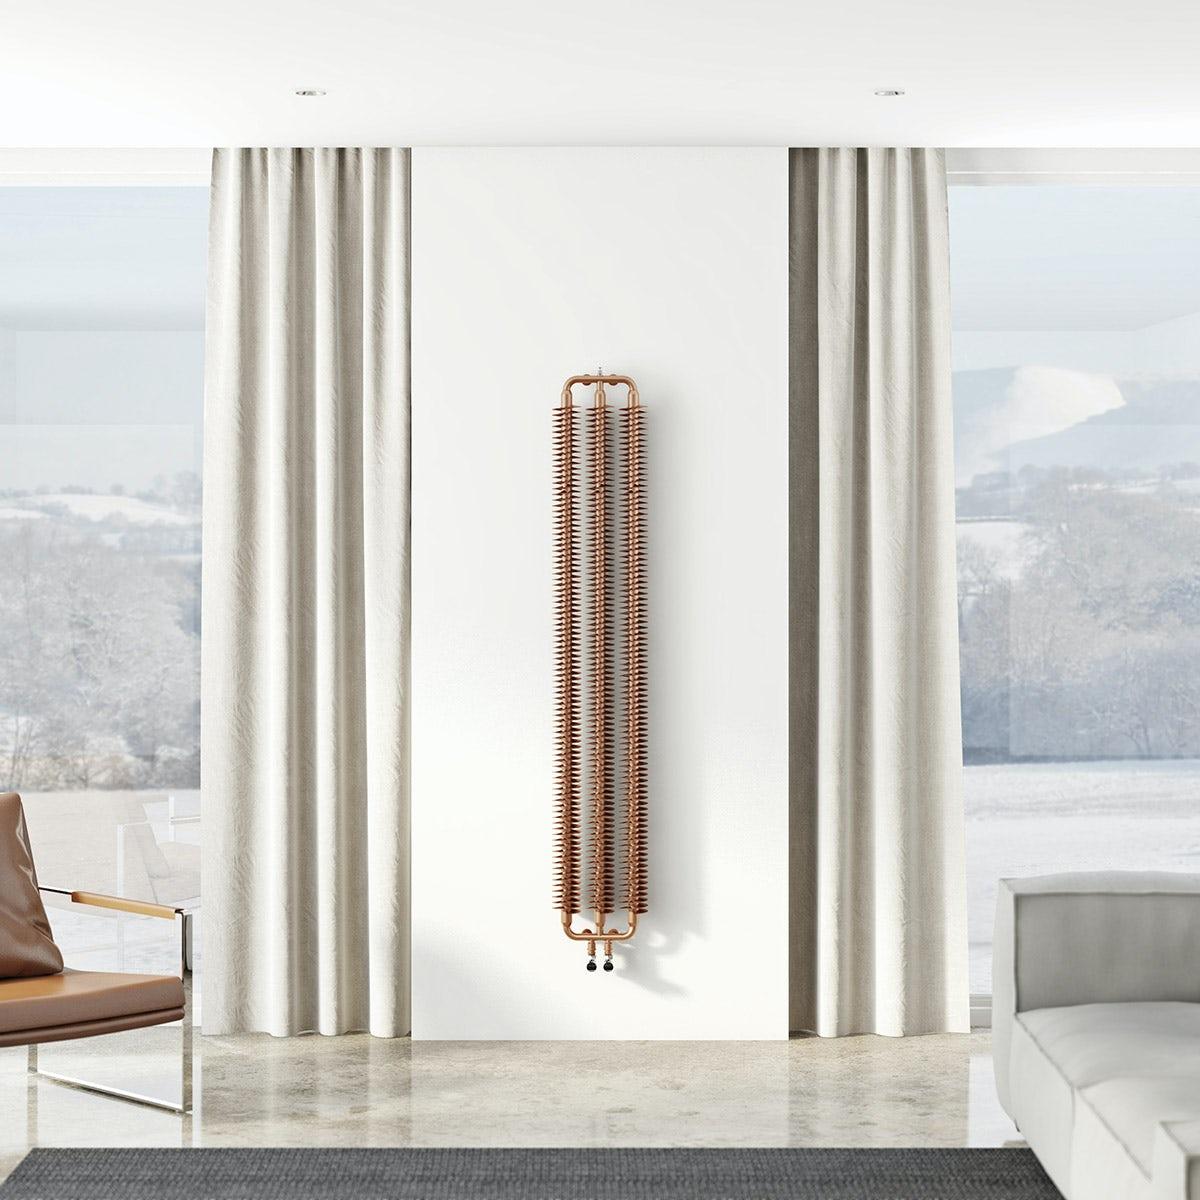 Terma Ribbon copper vertical radiator 1720 x 290